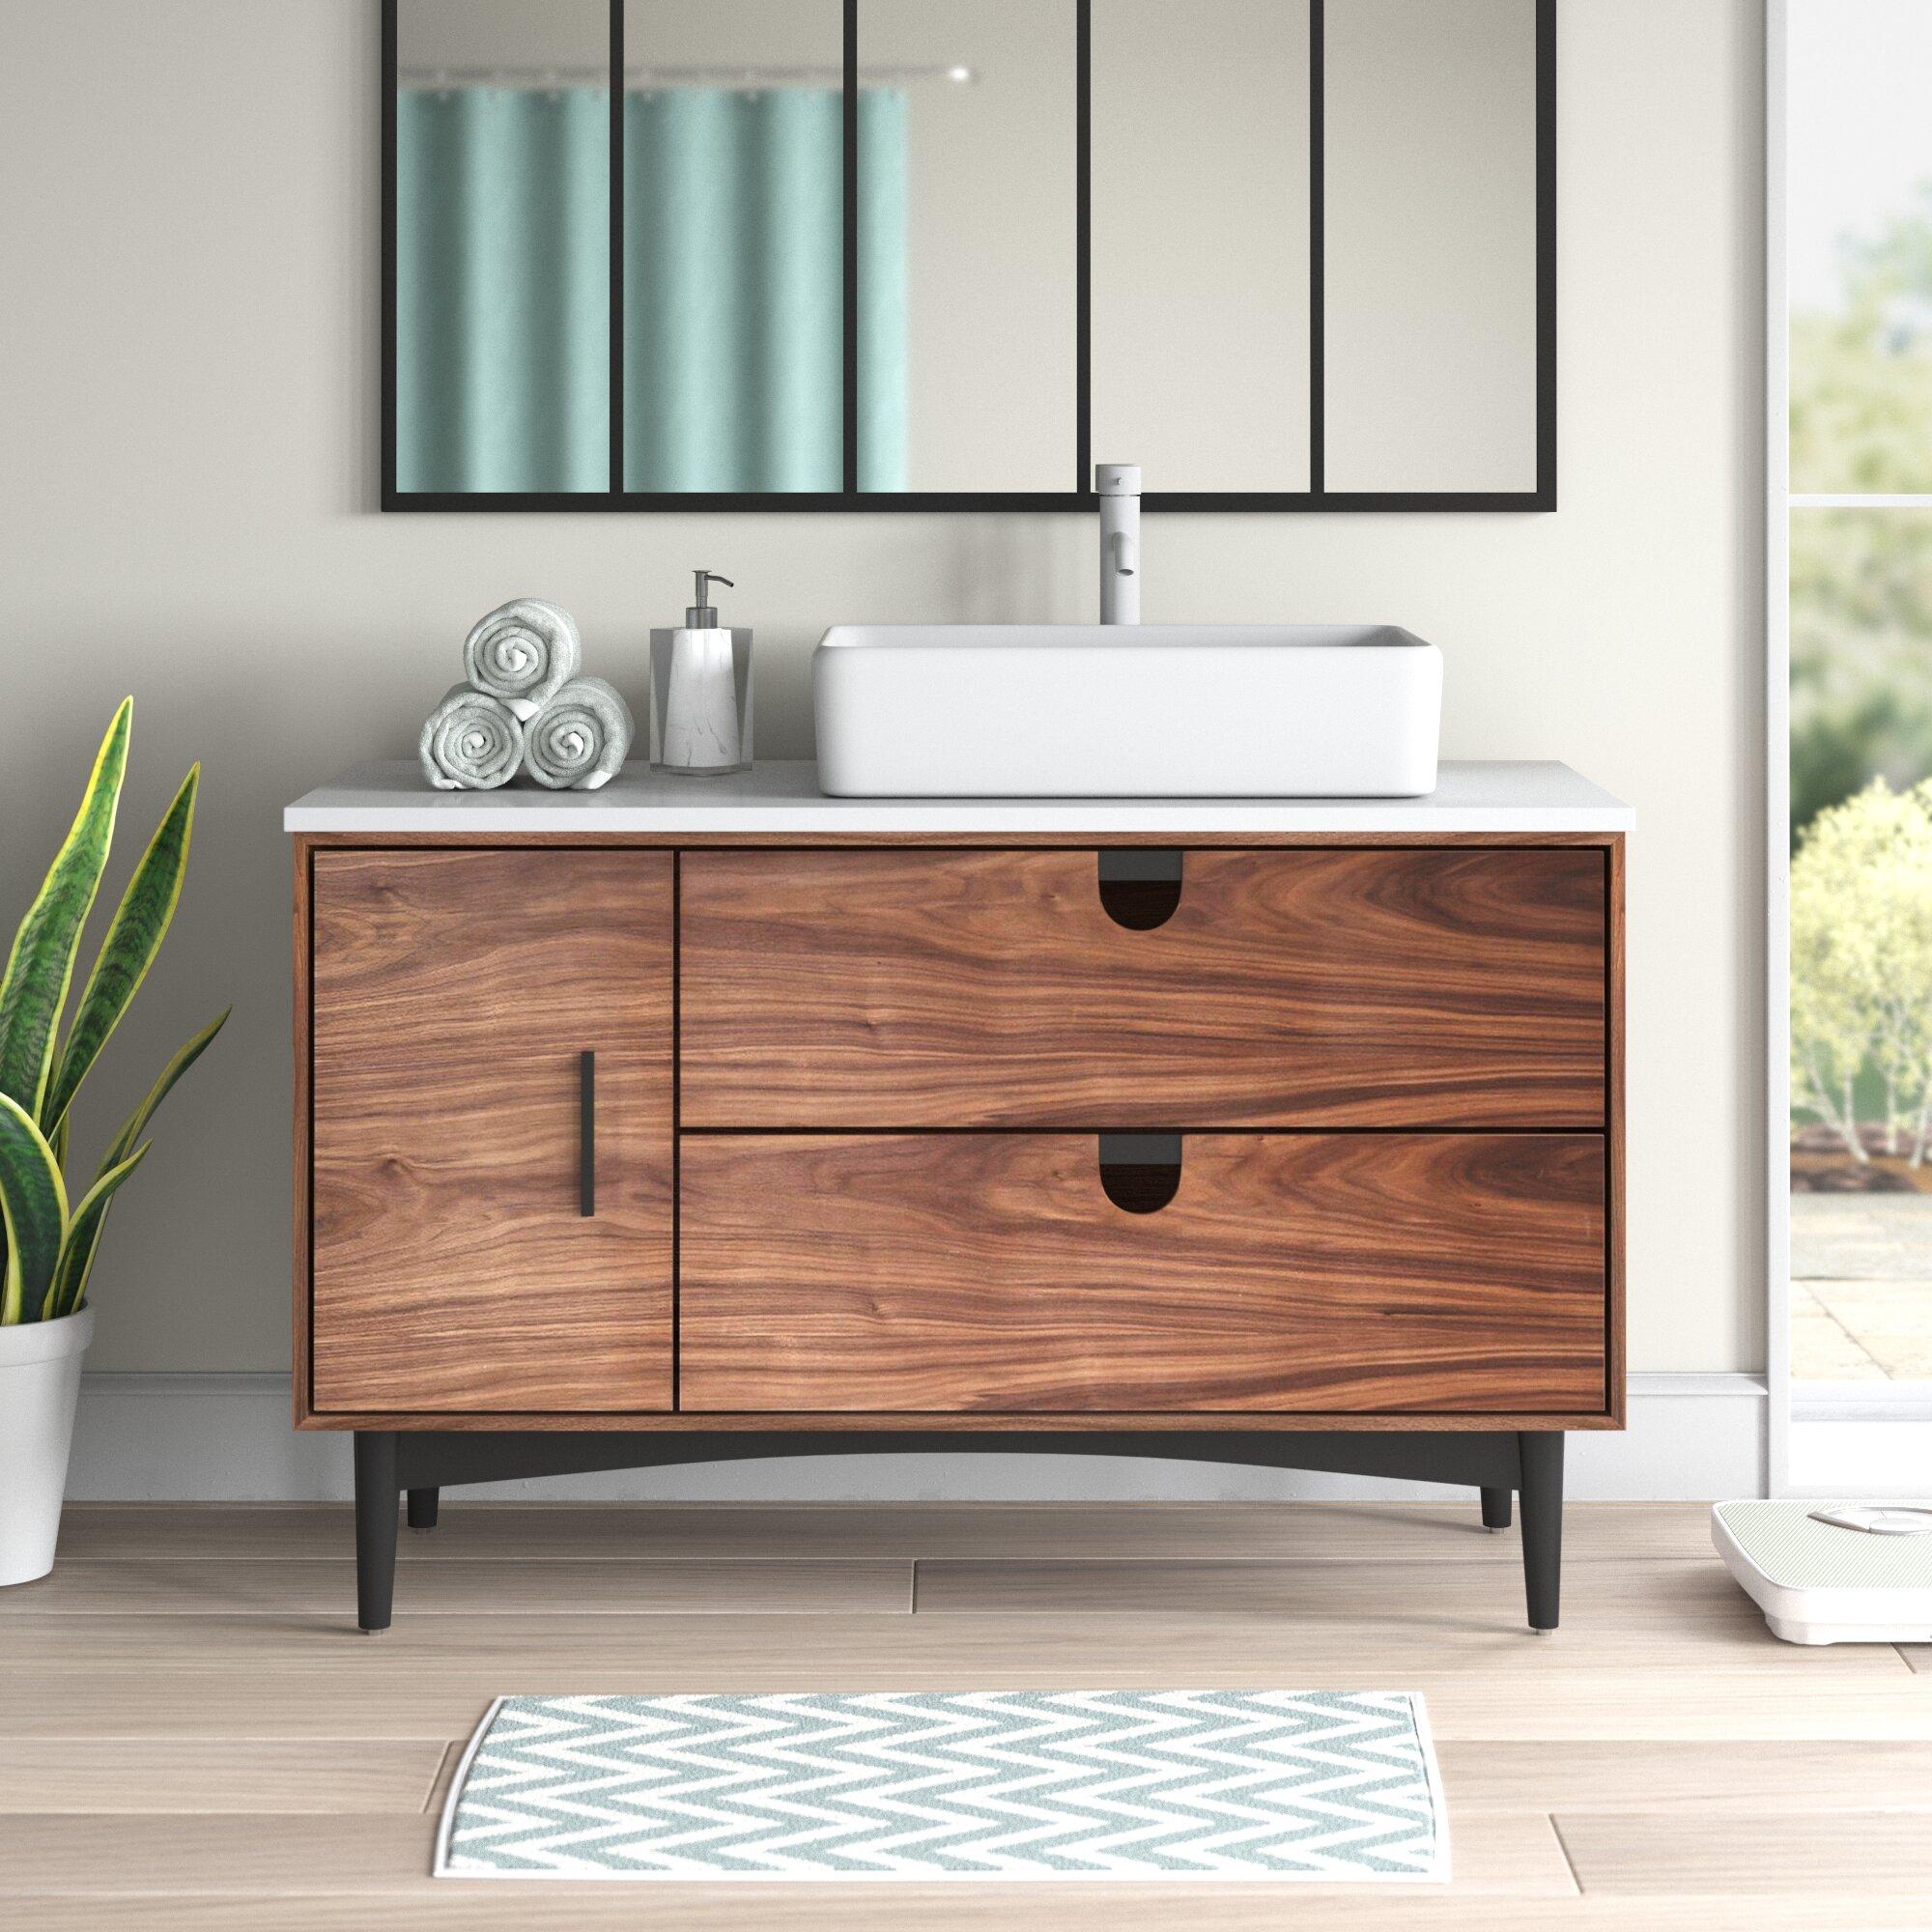 Kartonrepublic Portree 48 Single Bathroom Vanity Set Reviews Wayfair